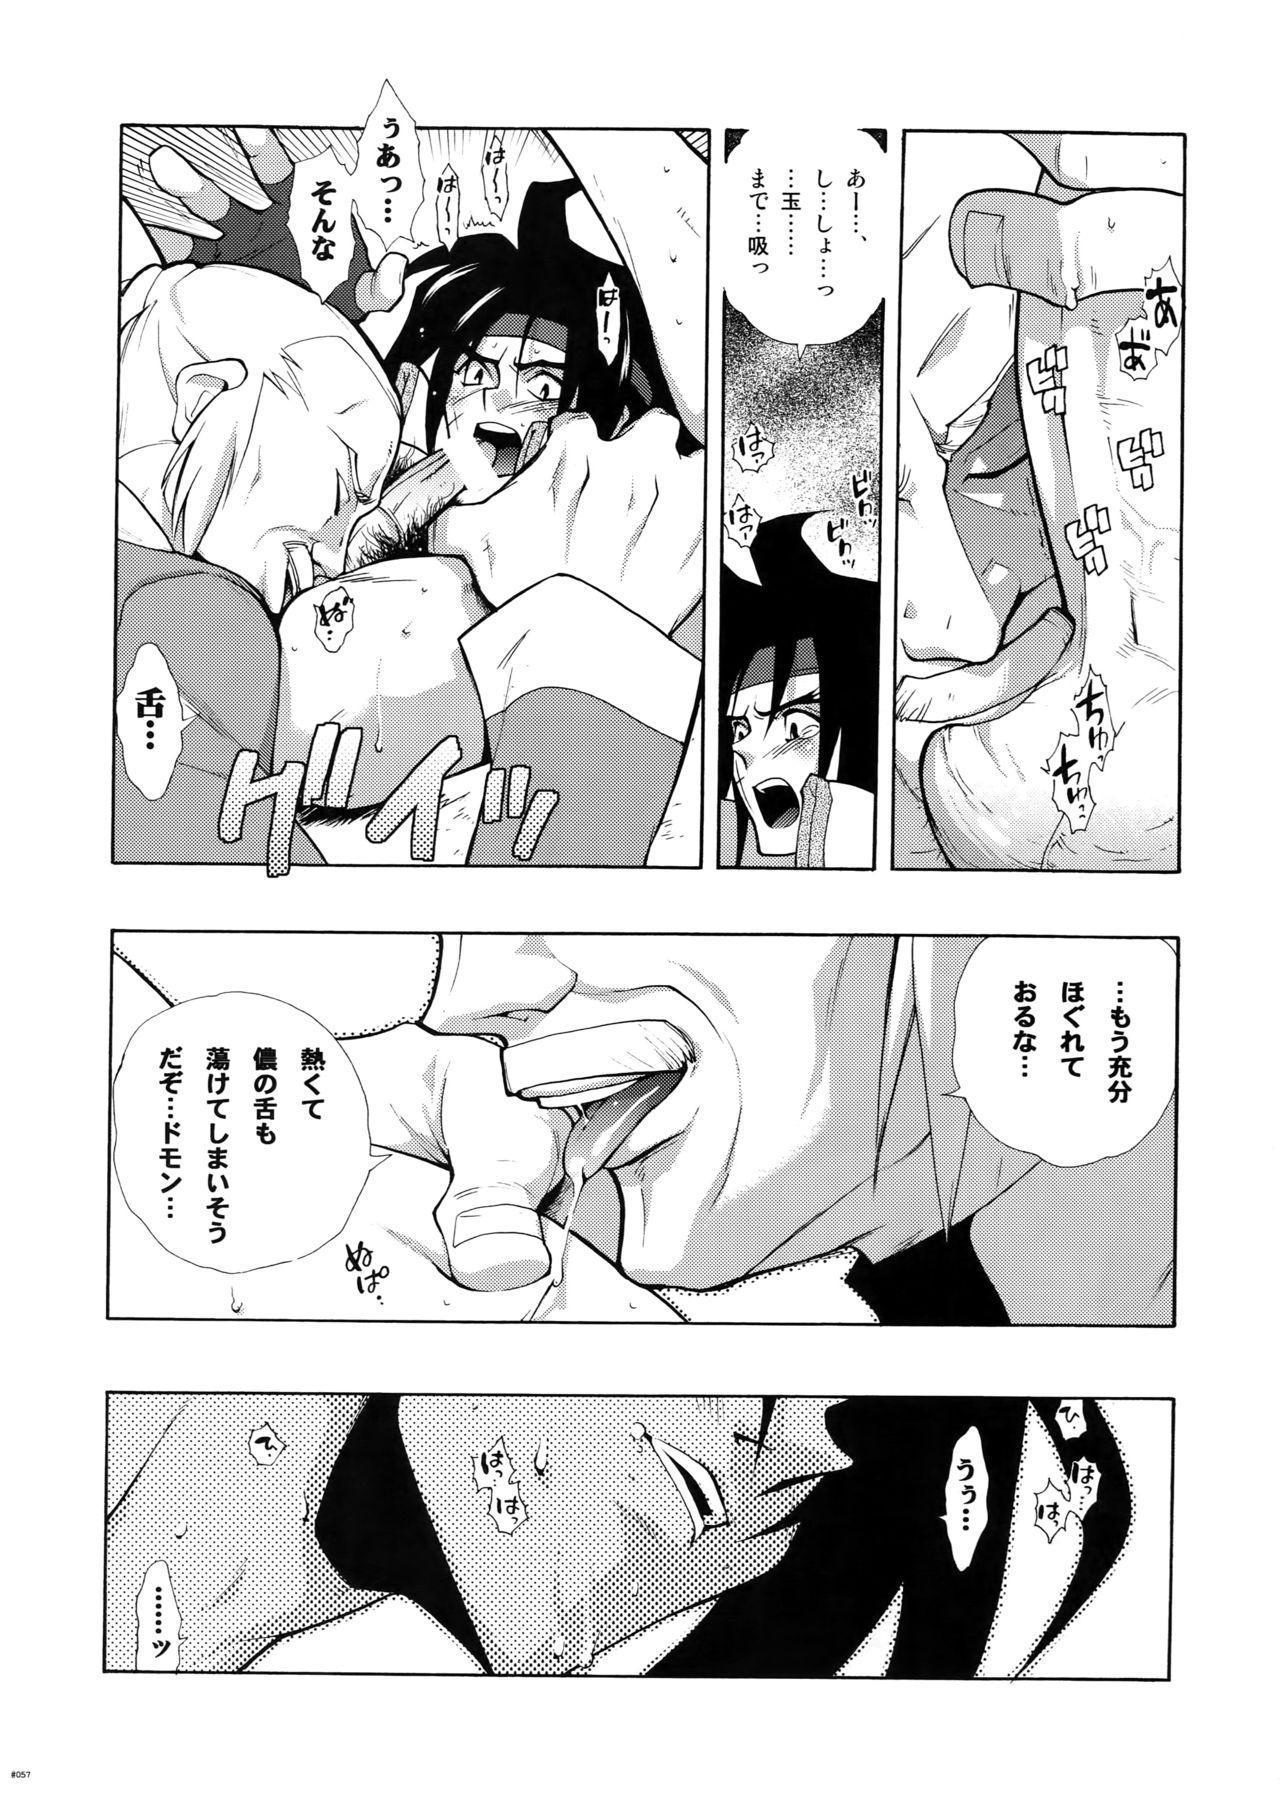 [Article 60 of Criminal Code (Shuhan)] G-gan Josei-Muke Sairoku-Shuu (G Gundam) 56